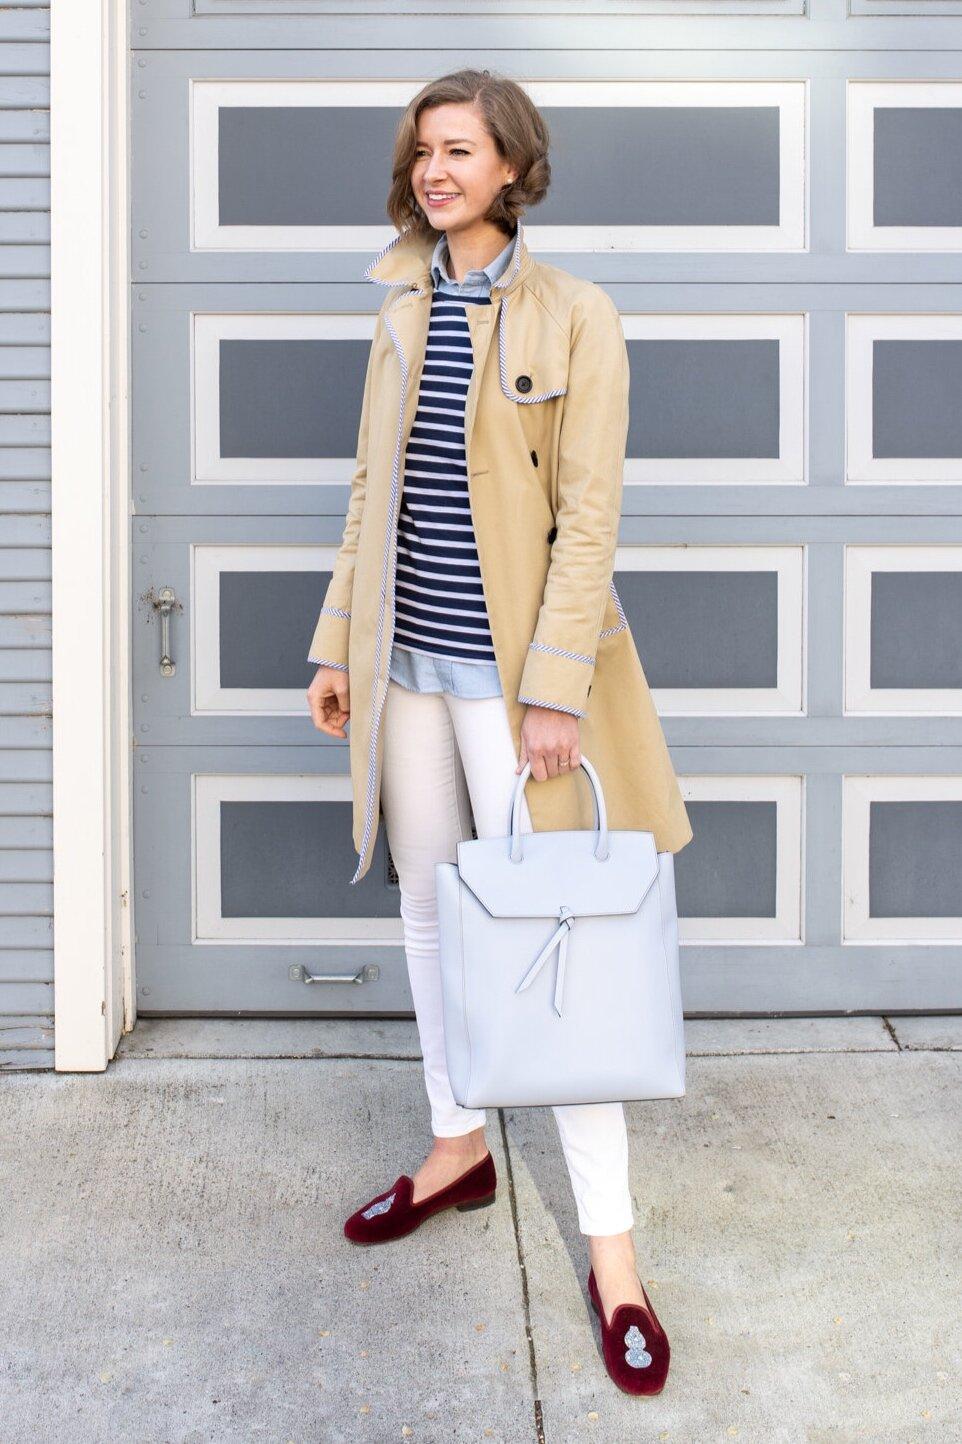 Alexandra de Curtis Sky Blue Tall Loren Tote Leather Handbag work tote